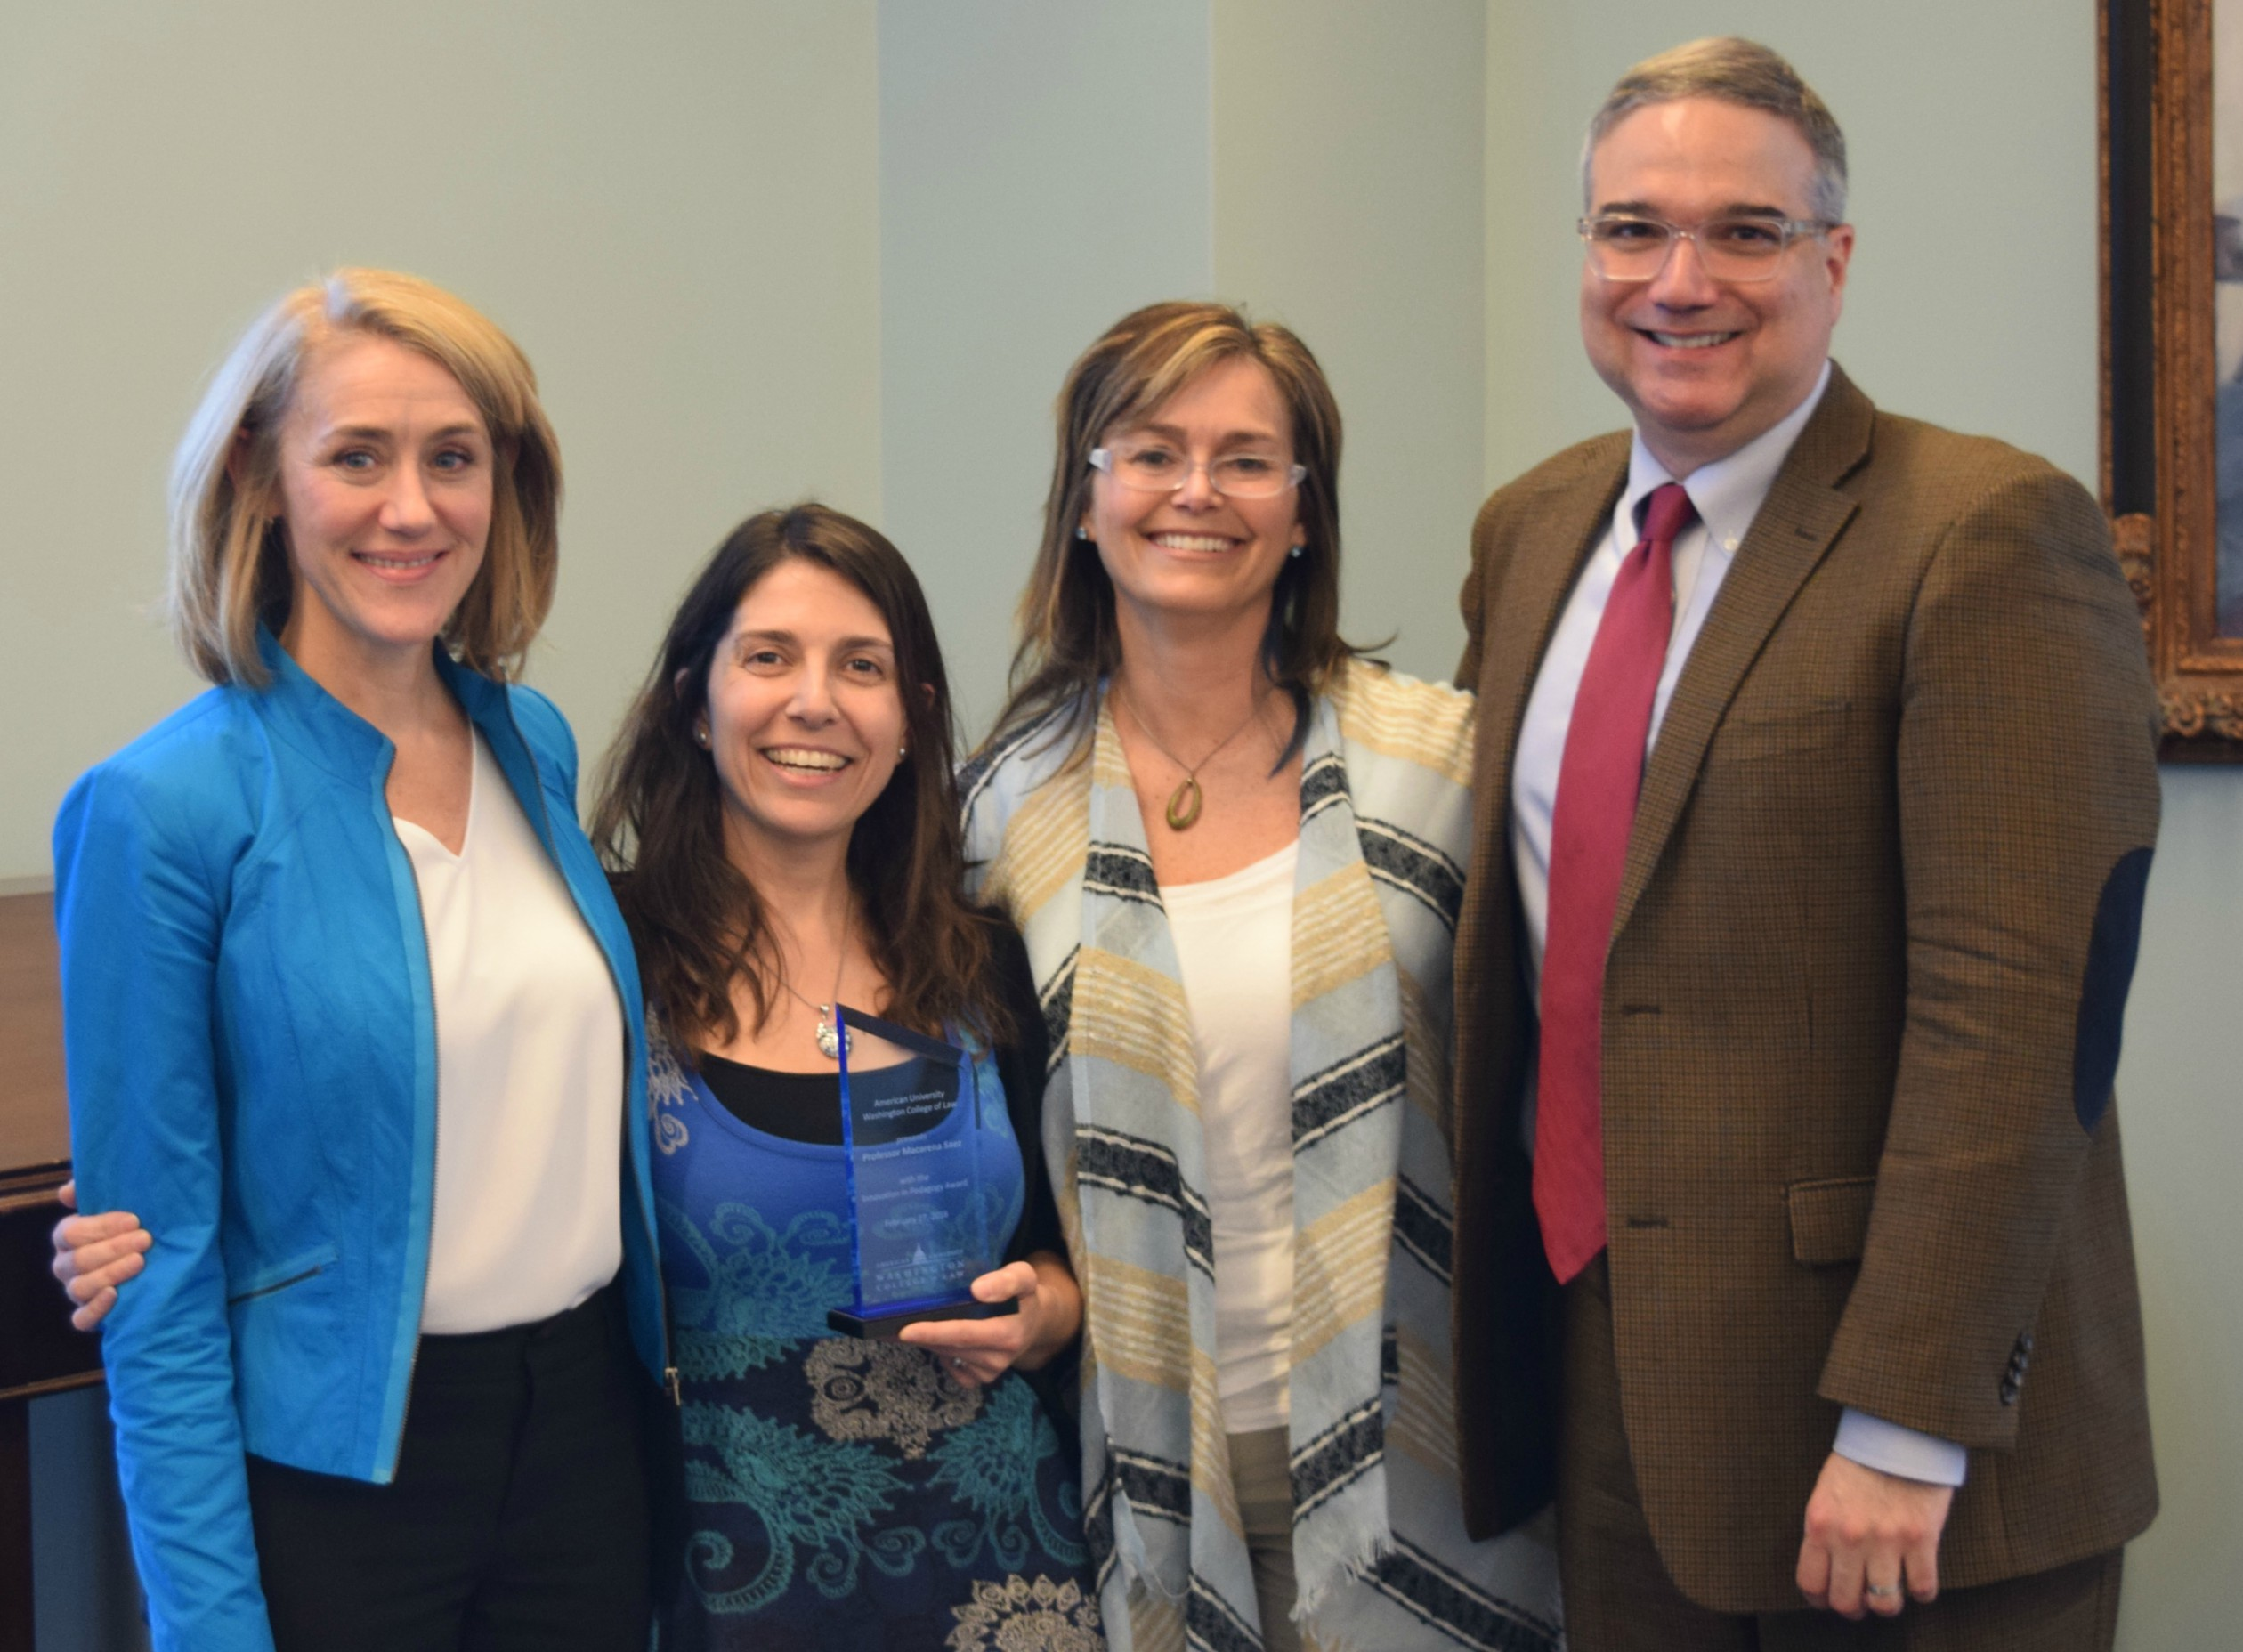 Left to right: Professors Christine Farley, Macarena Saez, Jennifer de Laurentiis, and Antony Varona.